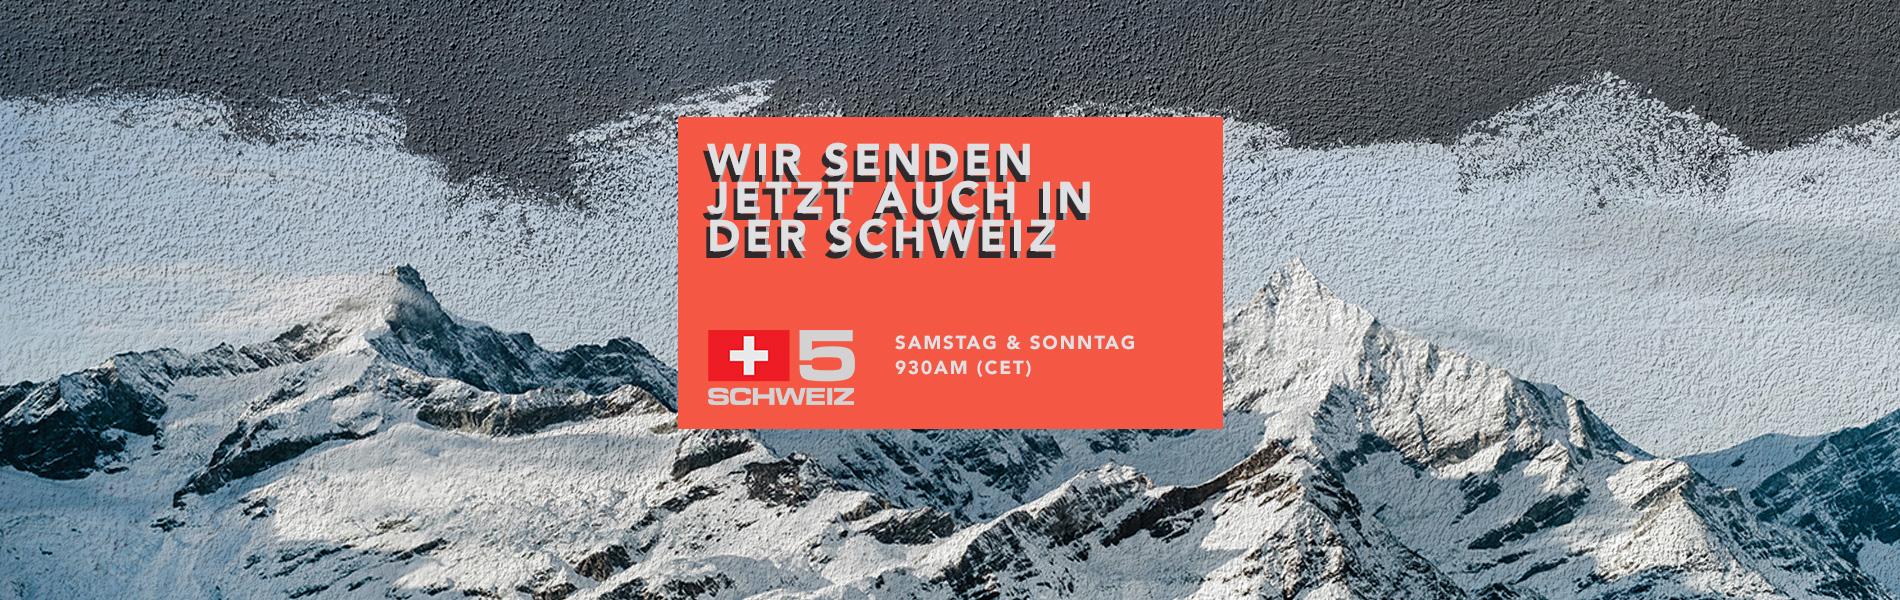 Schweiz_5_v4_DE_final Home | New Creation TV